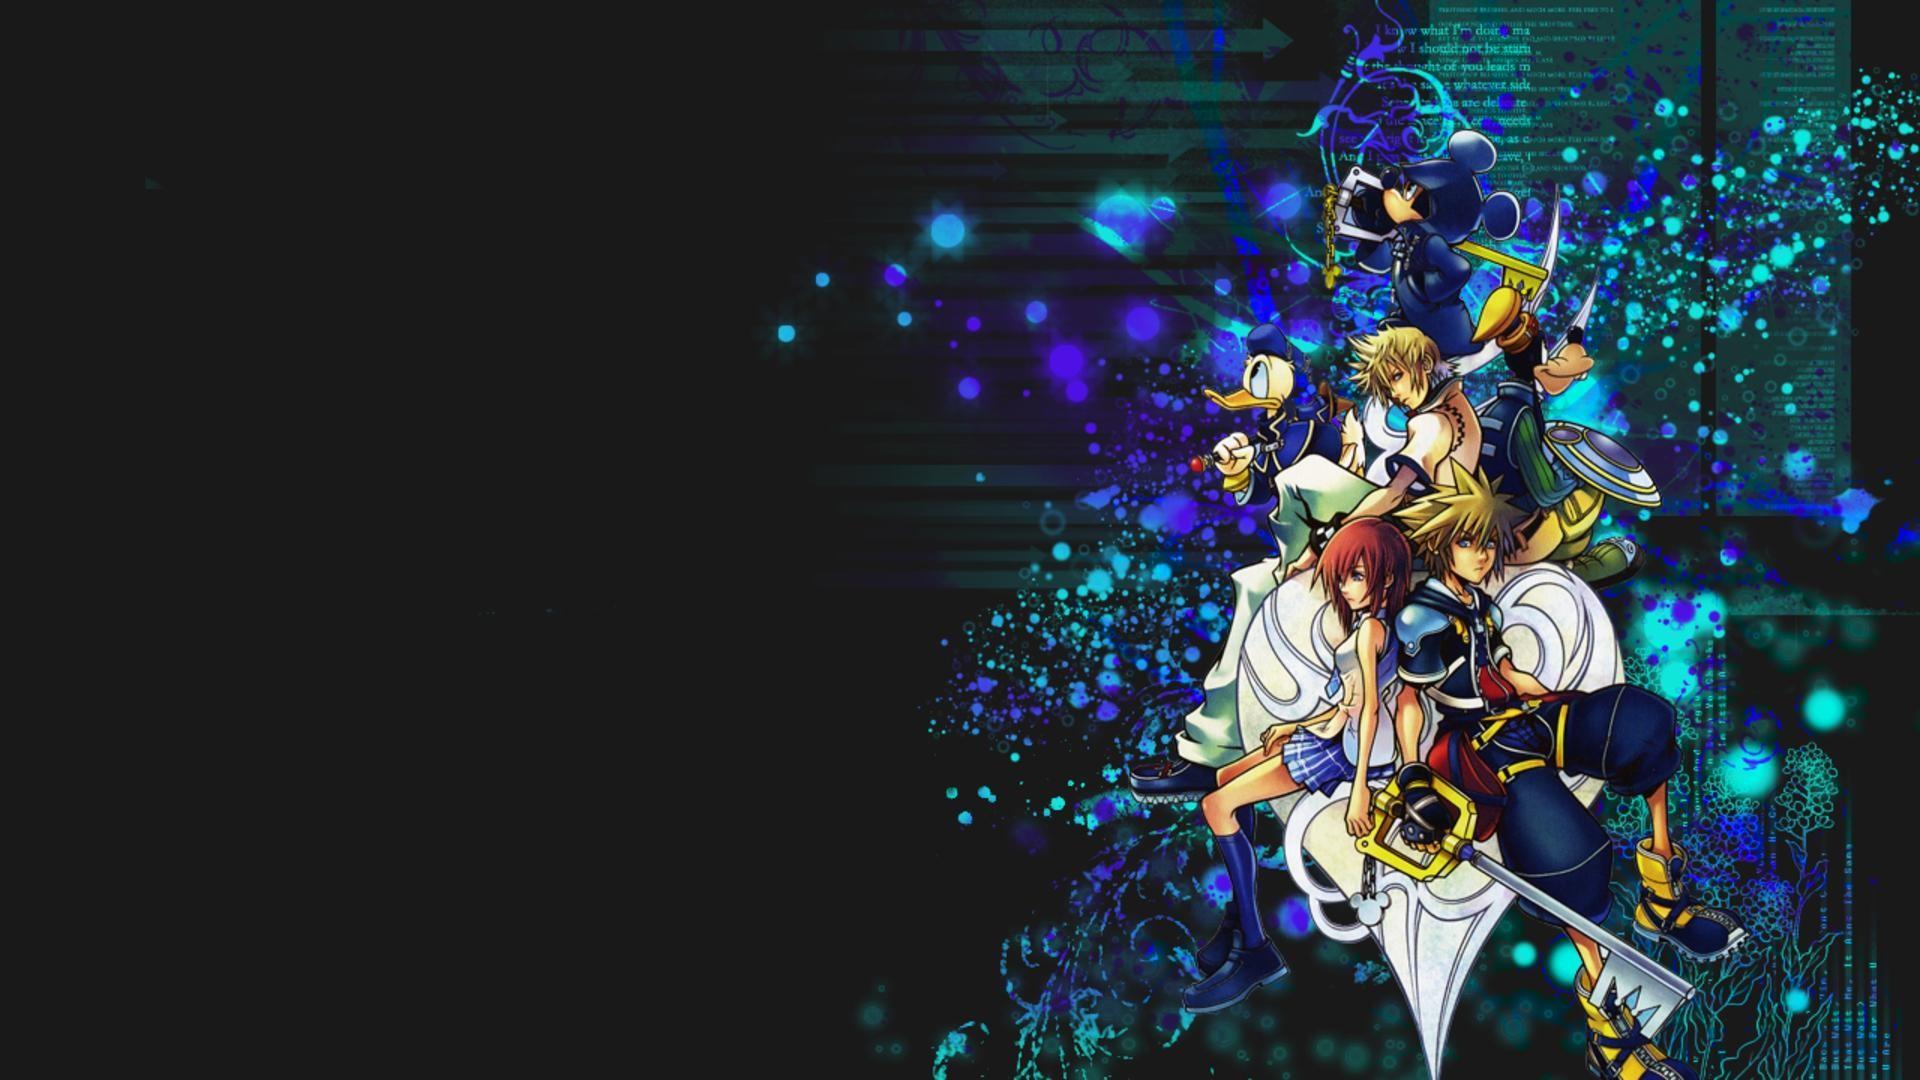 Kingdom Hearts 2 Backgrounds Wallpapertag